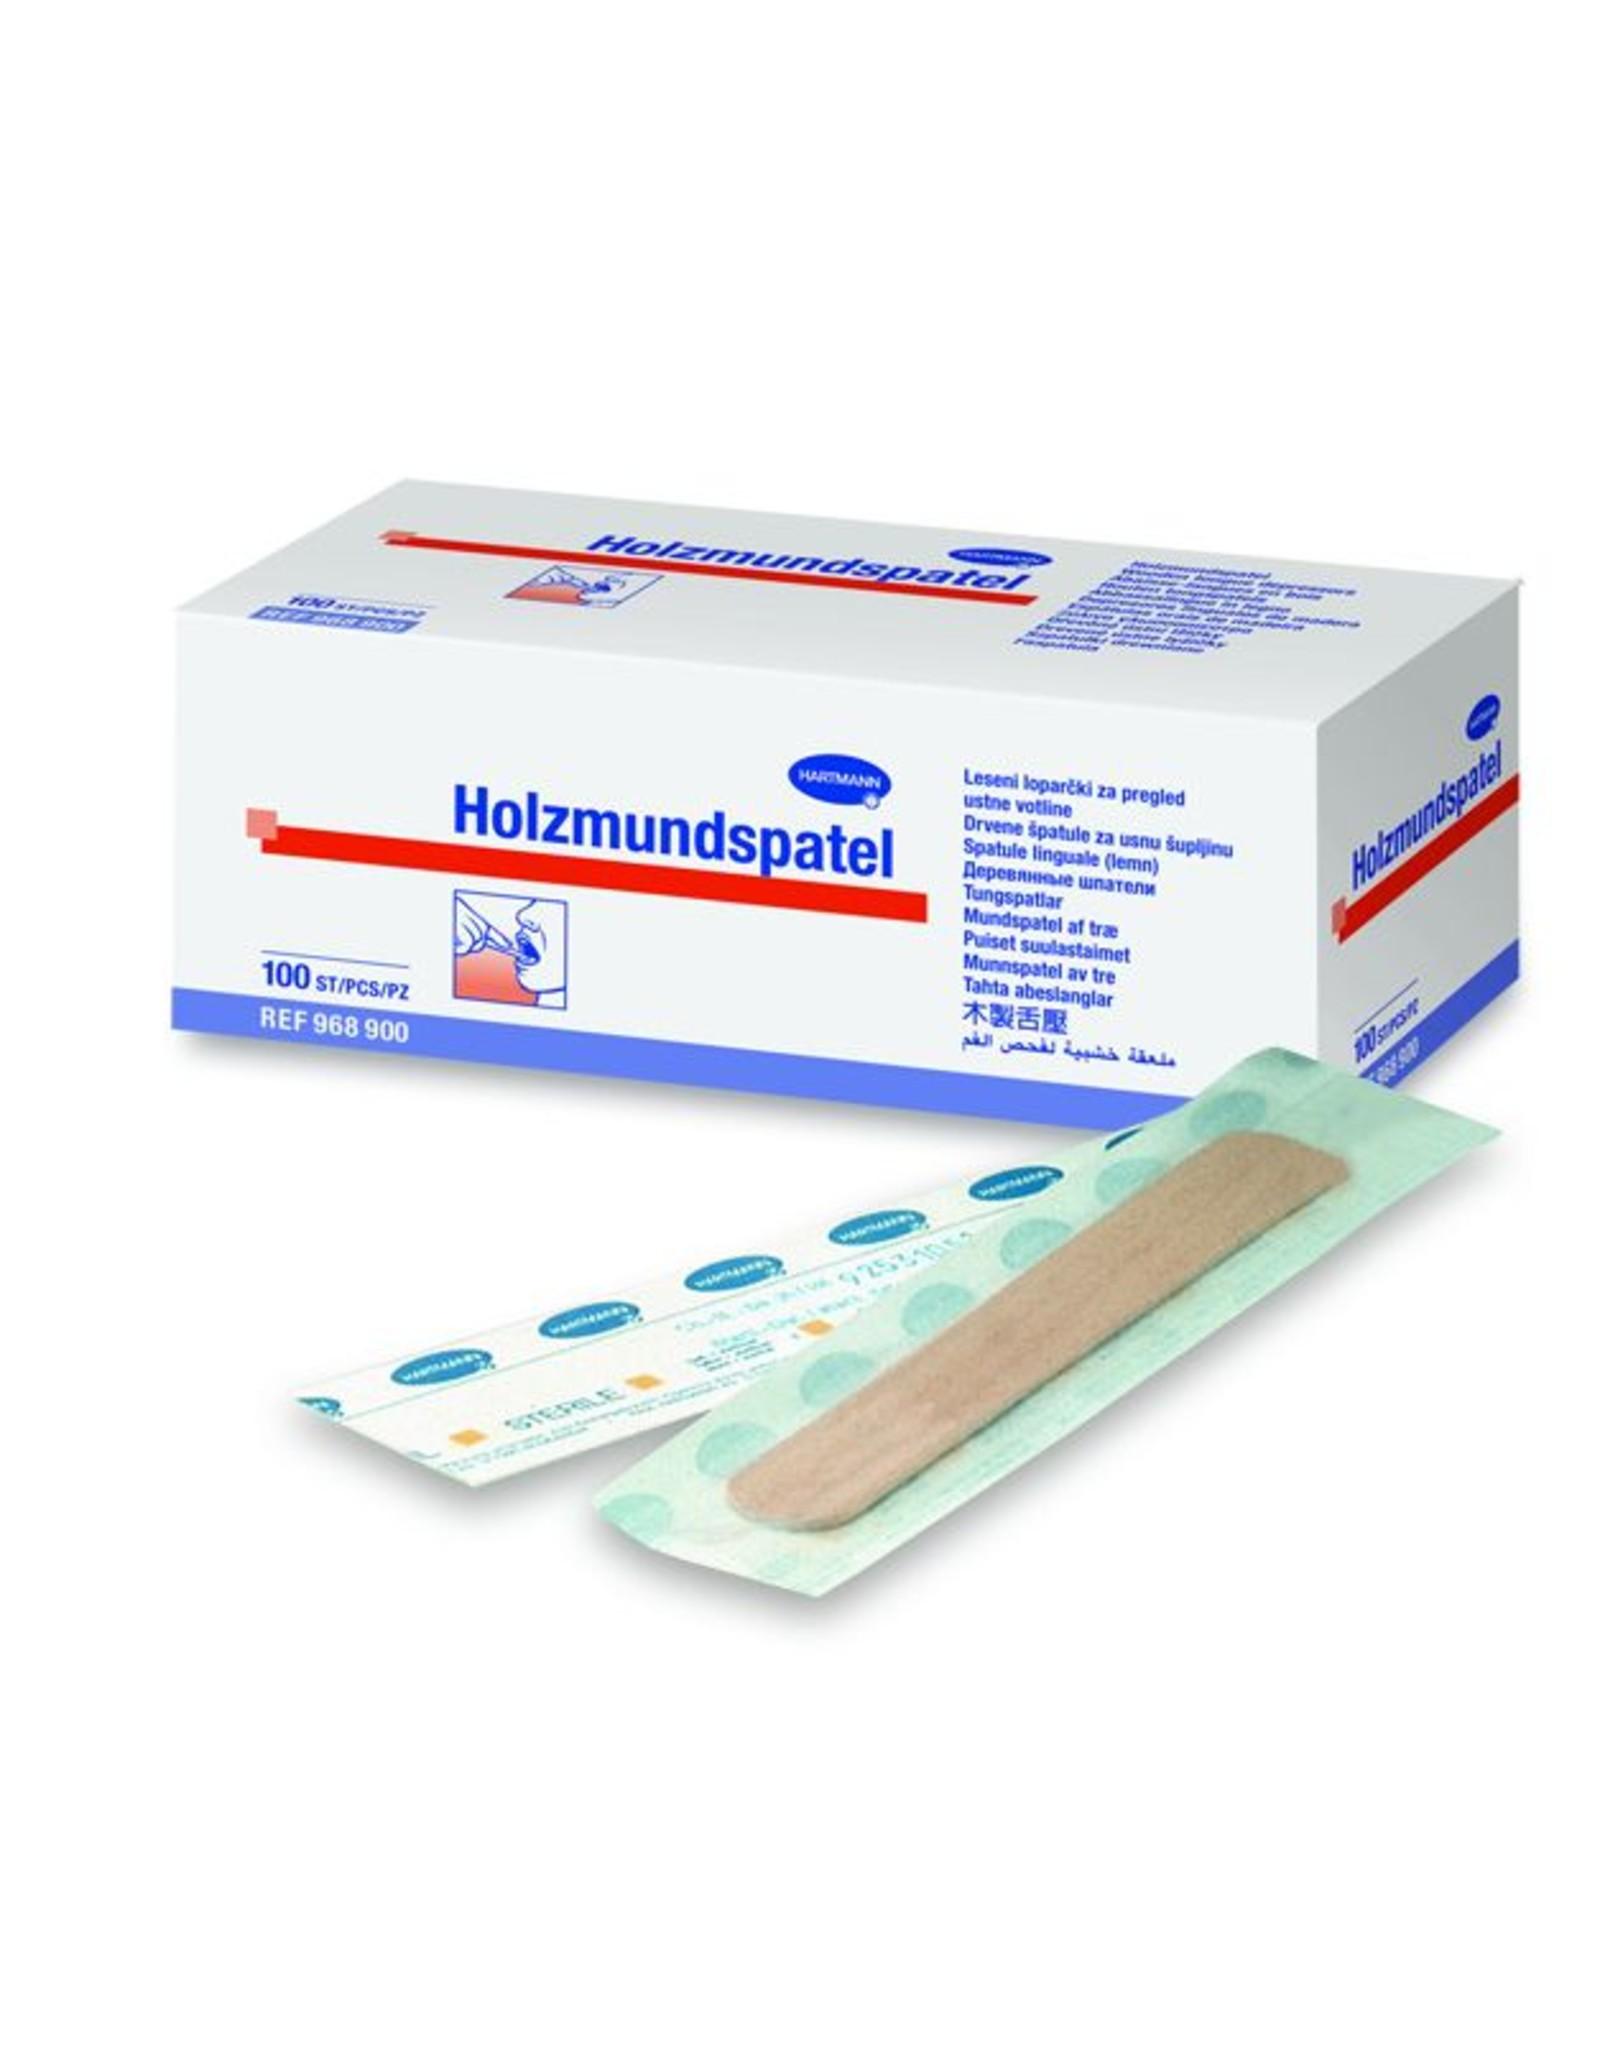 Hartmann Hartmann Holzmundspatel 100 Stk.